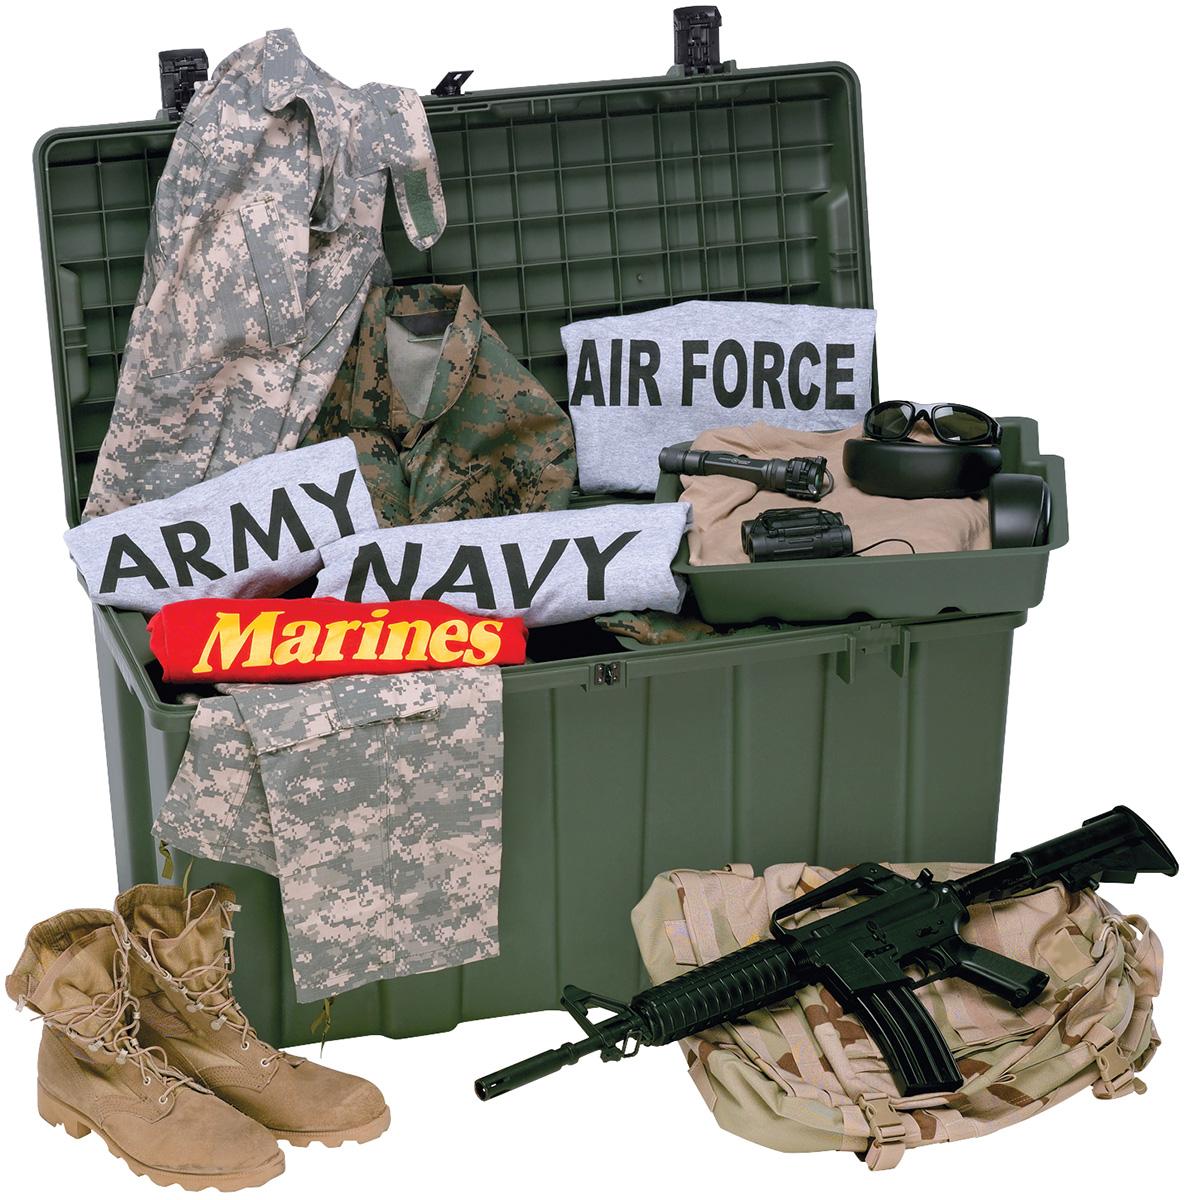 Pelican Peli Products IMTRLK Military Secure Field Trunk Locker